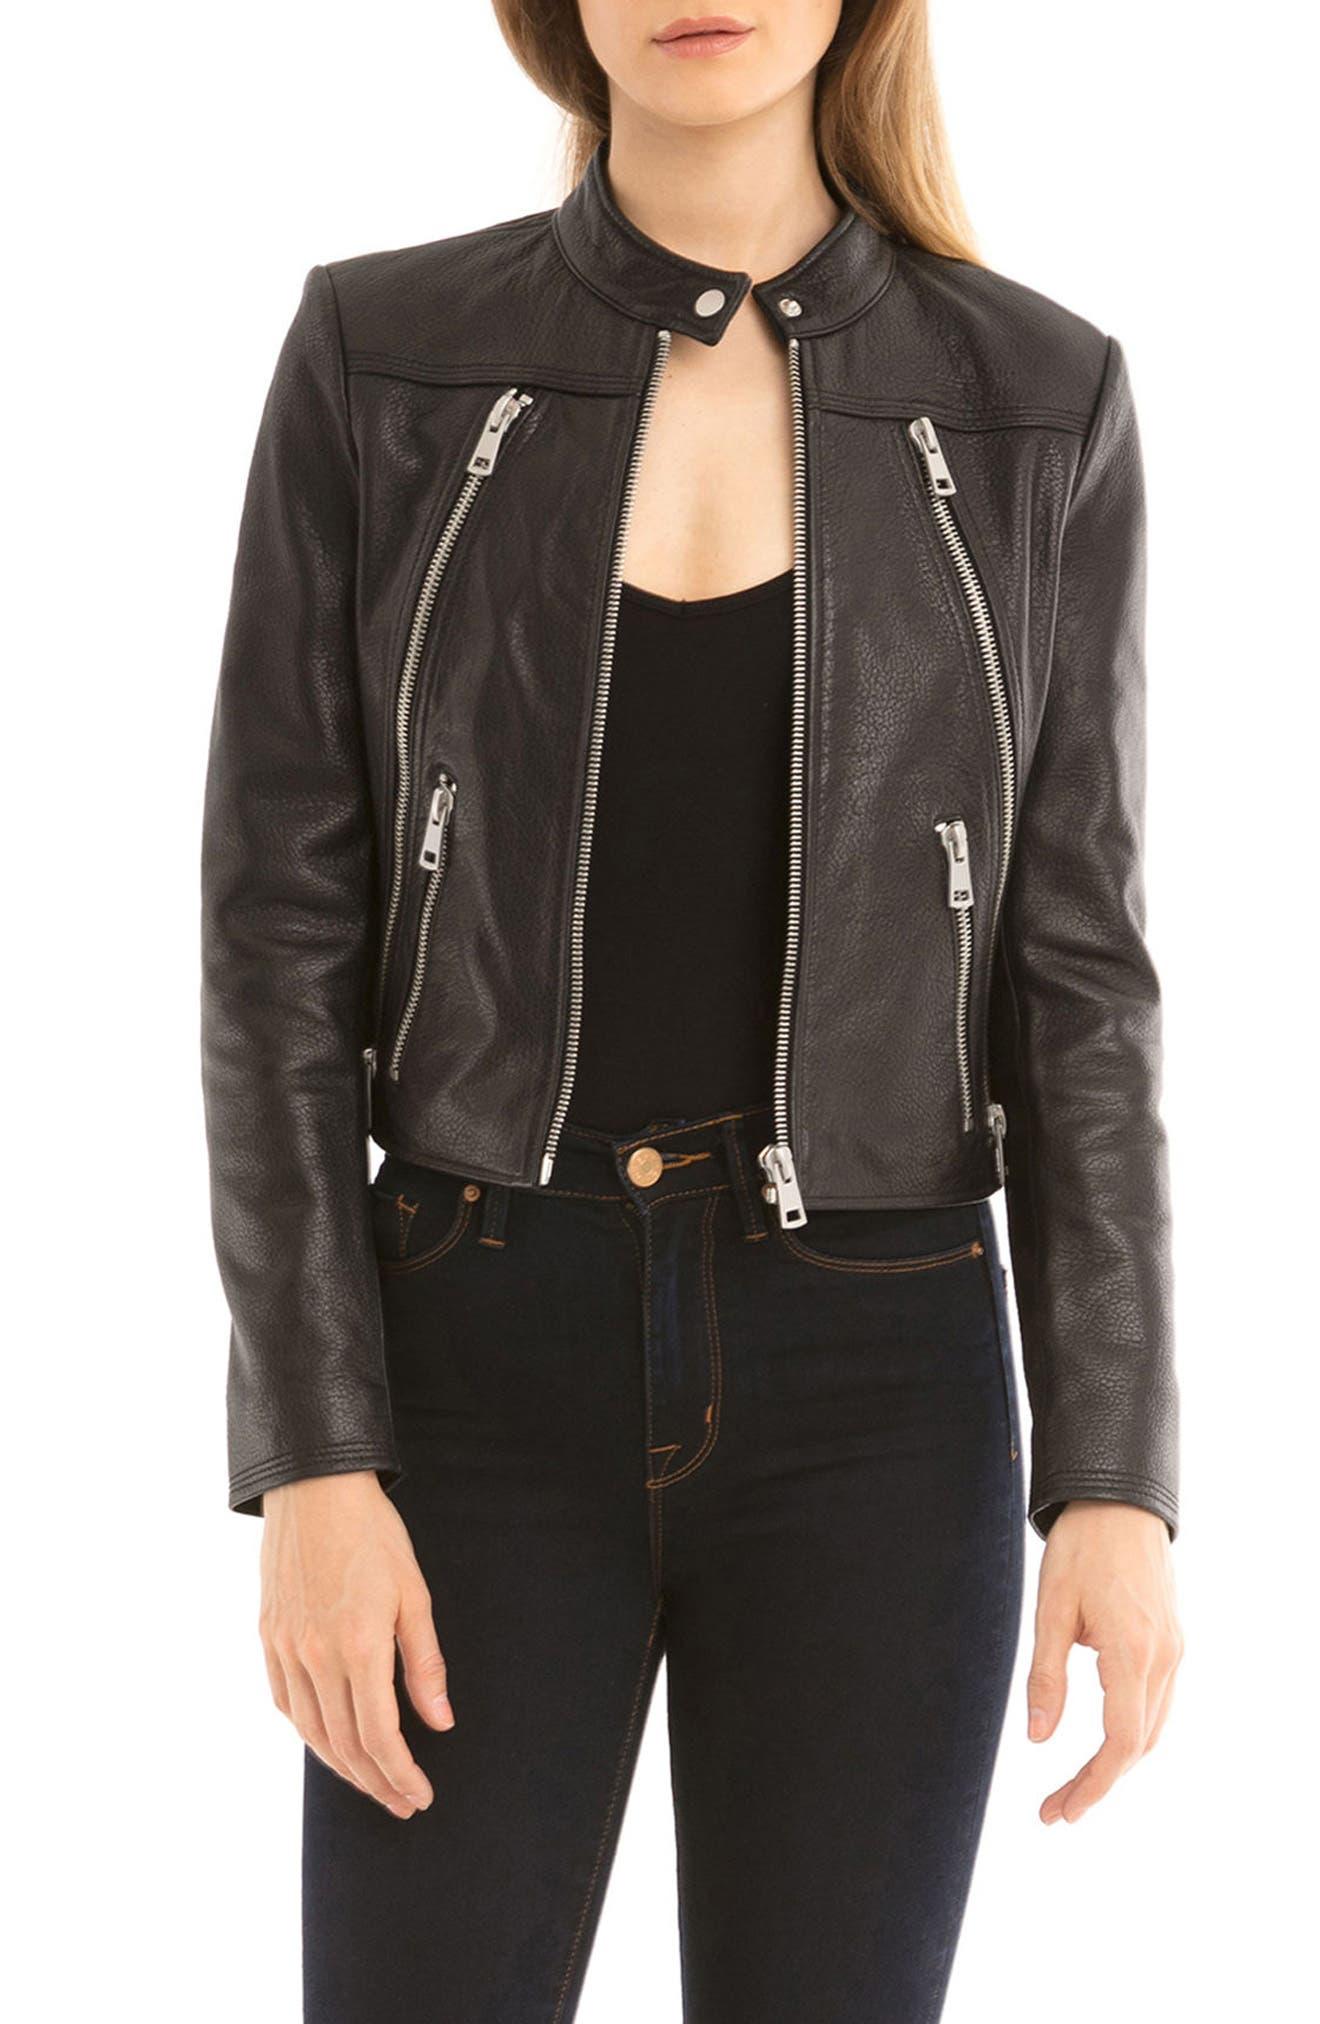 BAGATELLE NYC Bagatelle Textured Leather Jacket